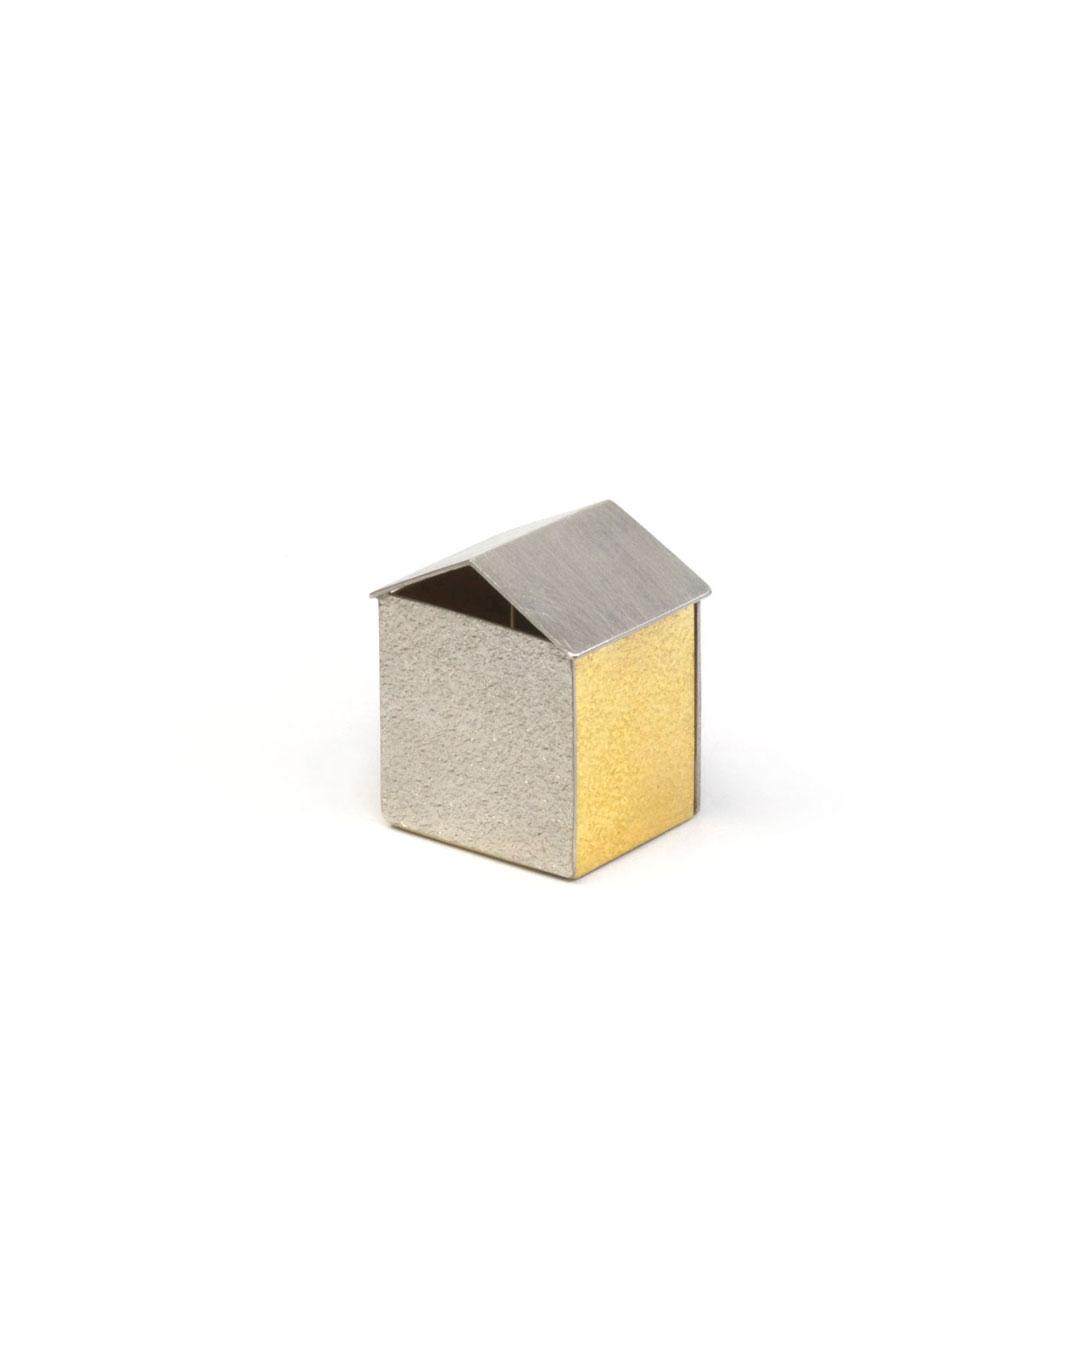 Okinari Kurokawa, untitled, 2008, ring; 970 silver, 835 gold, 24 x 21 x 17 mm, €1700